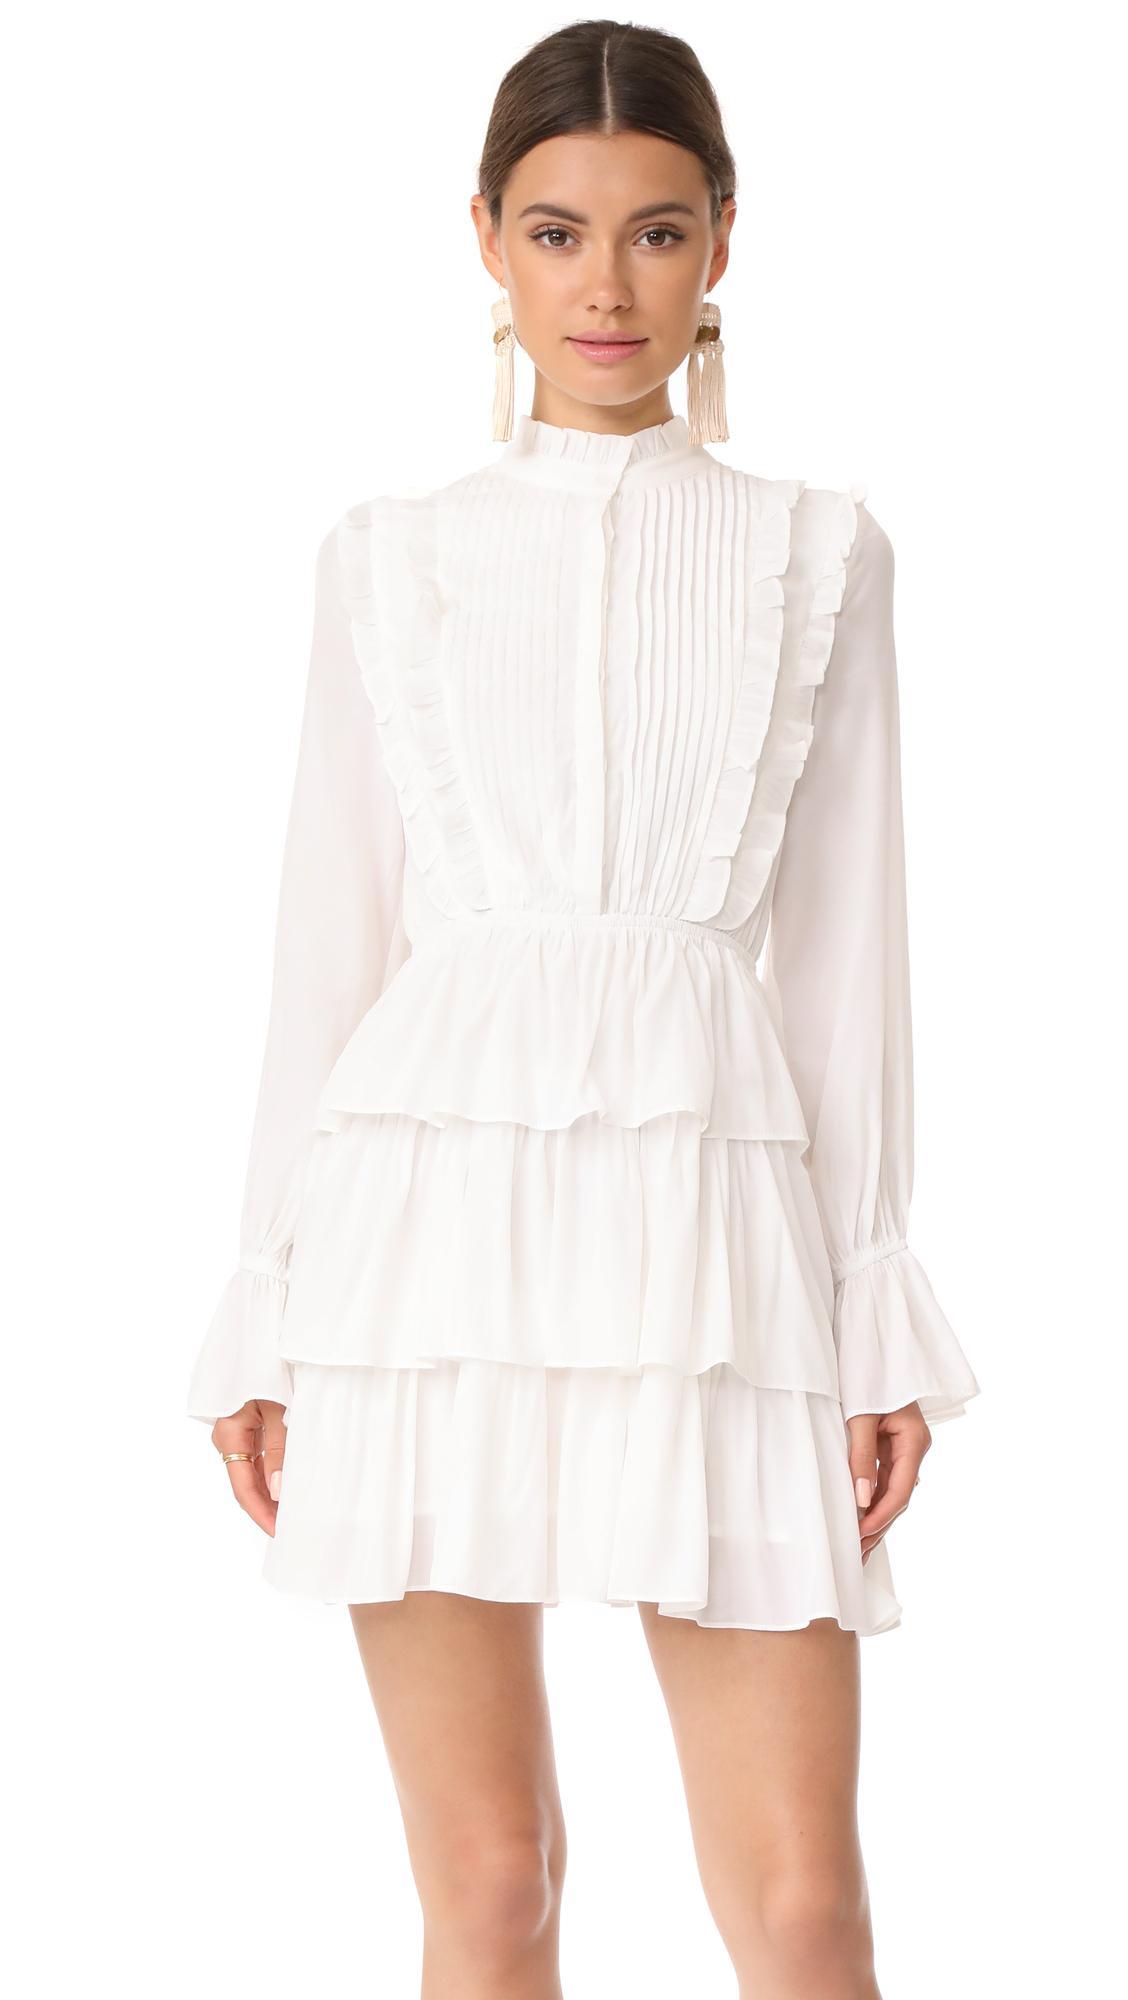 Moon River Ruffle Long Sleeve Dress in White - Lyst